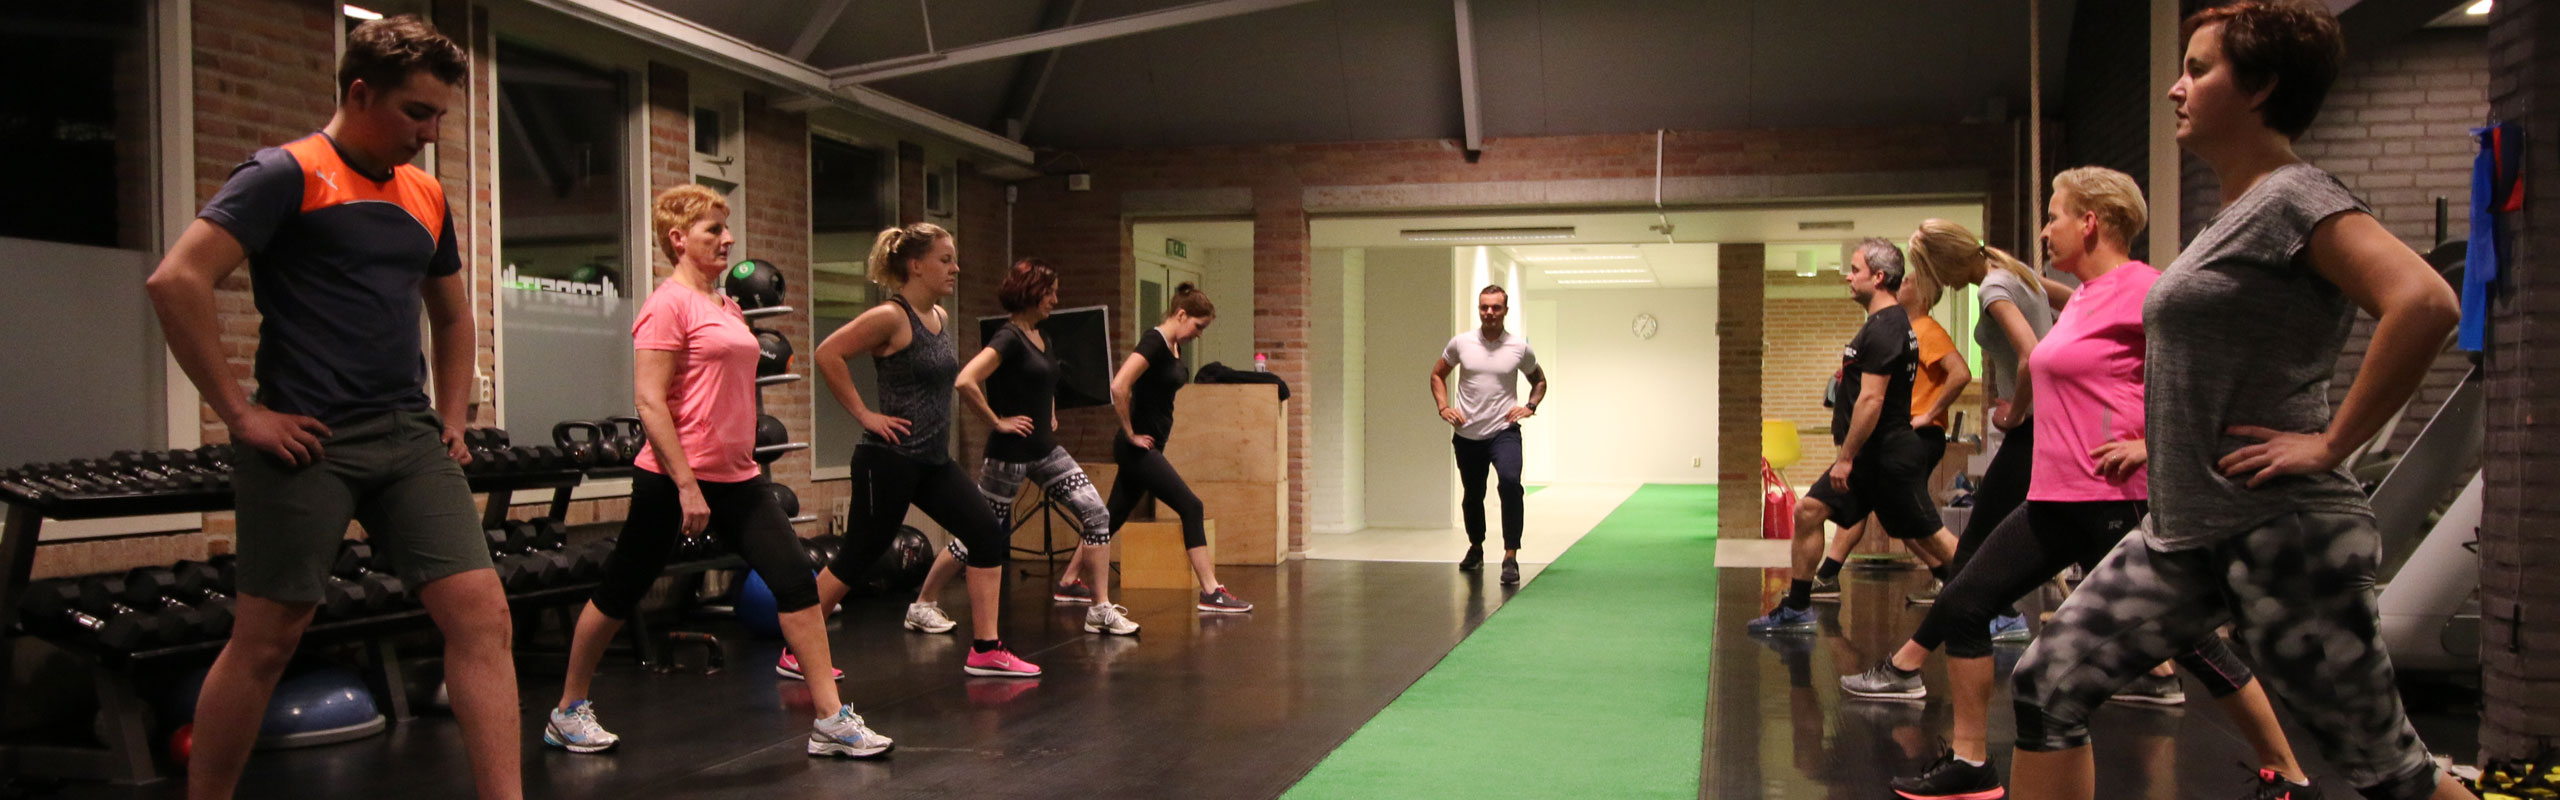 small group training - Topfit Ammerzoden